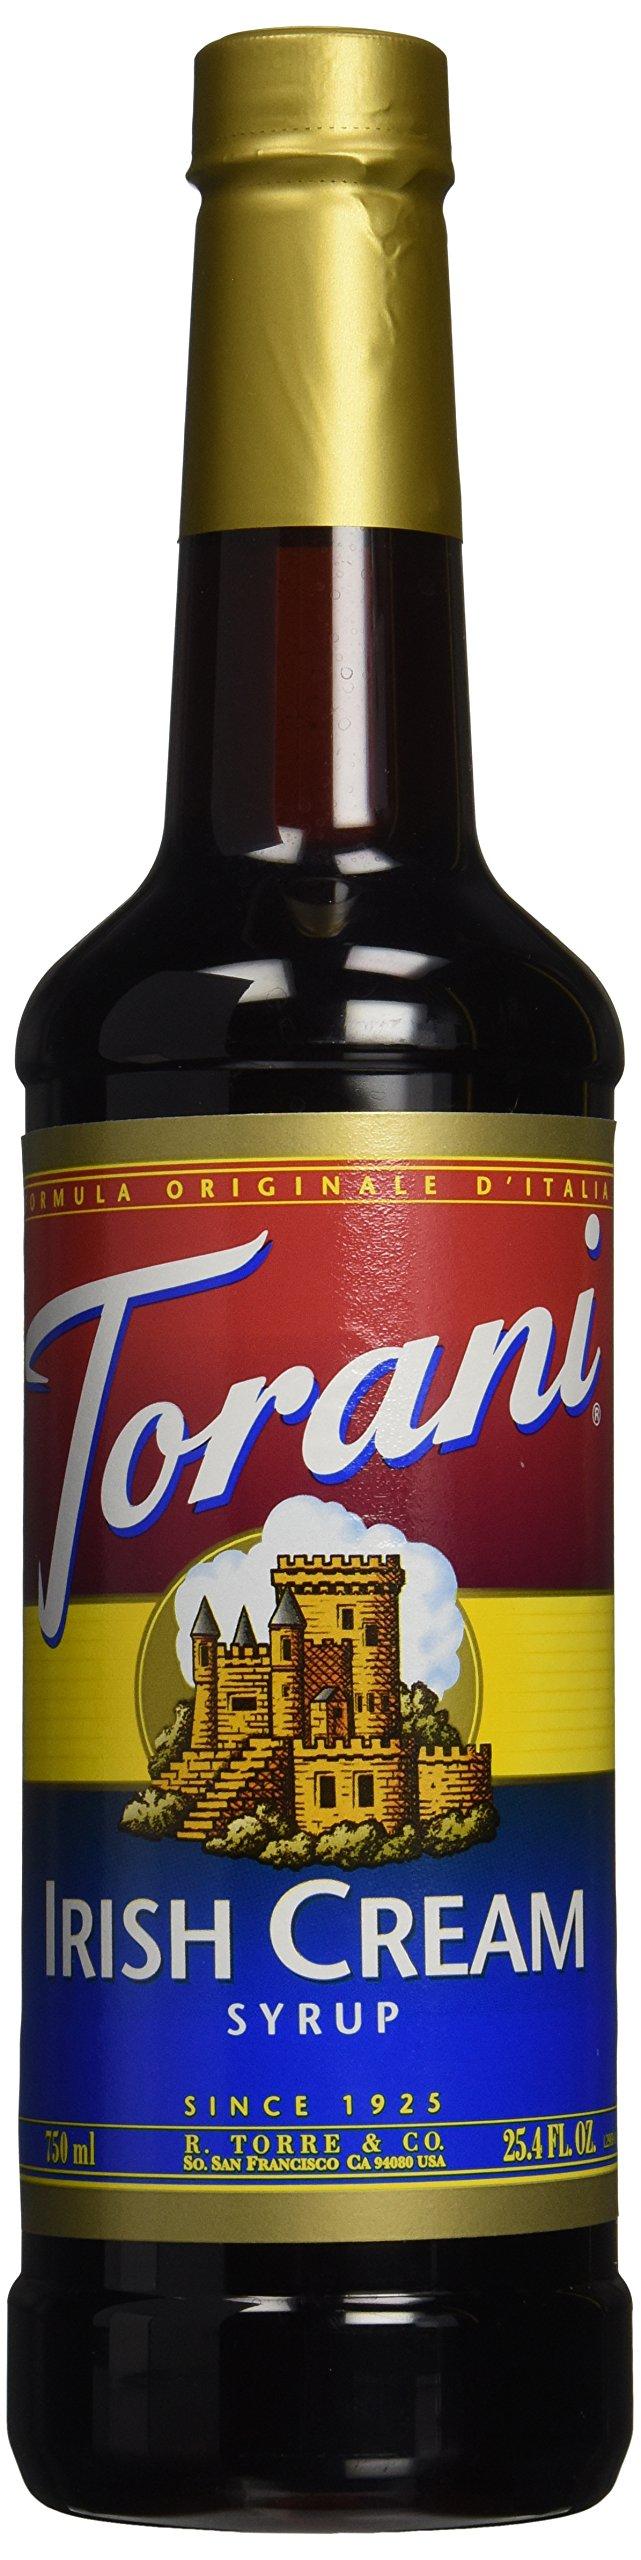 Torani Irish Cream Syrup, 25.4 Ounce